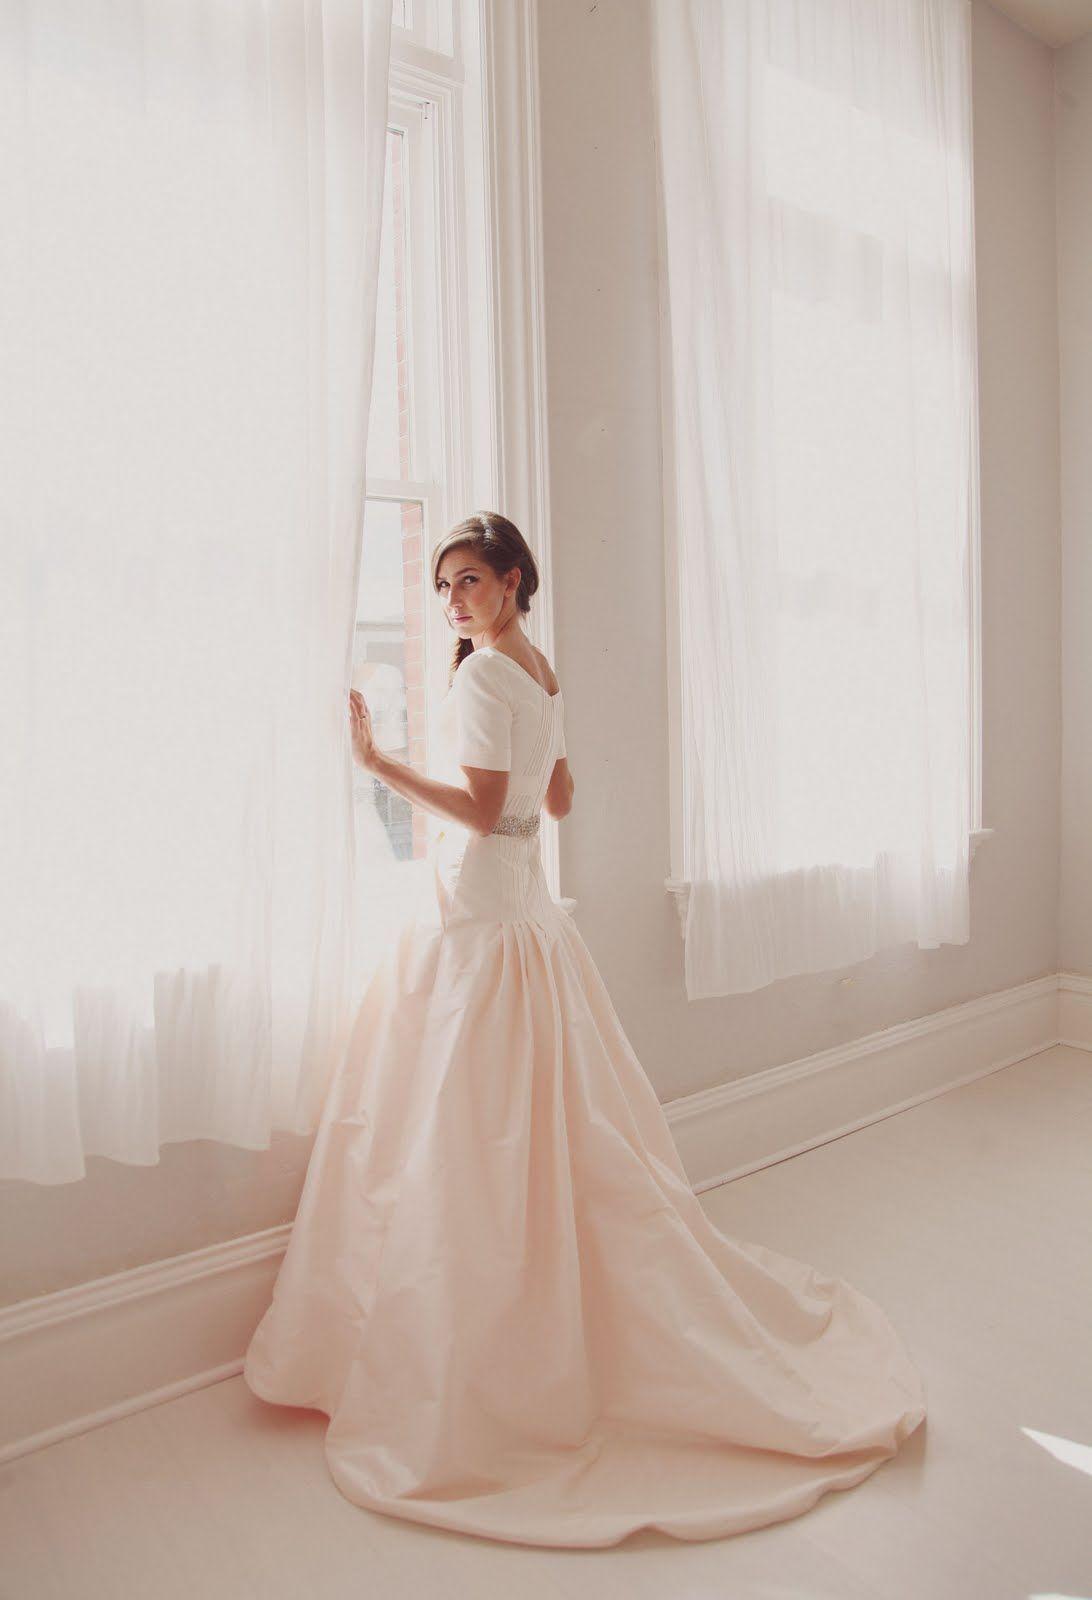 Pin by jazmin ishida on wedding dresses in pinterest